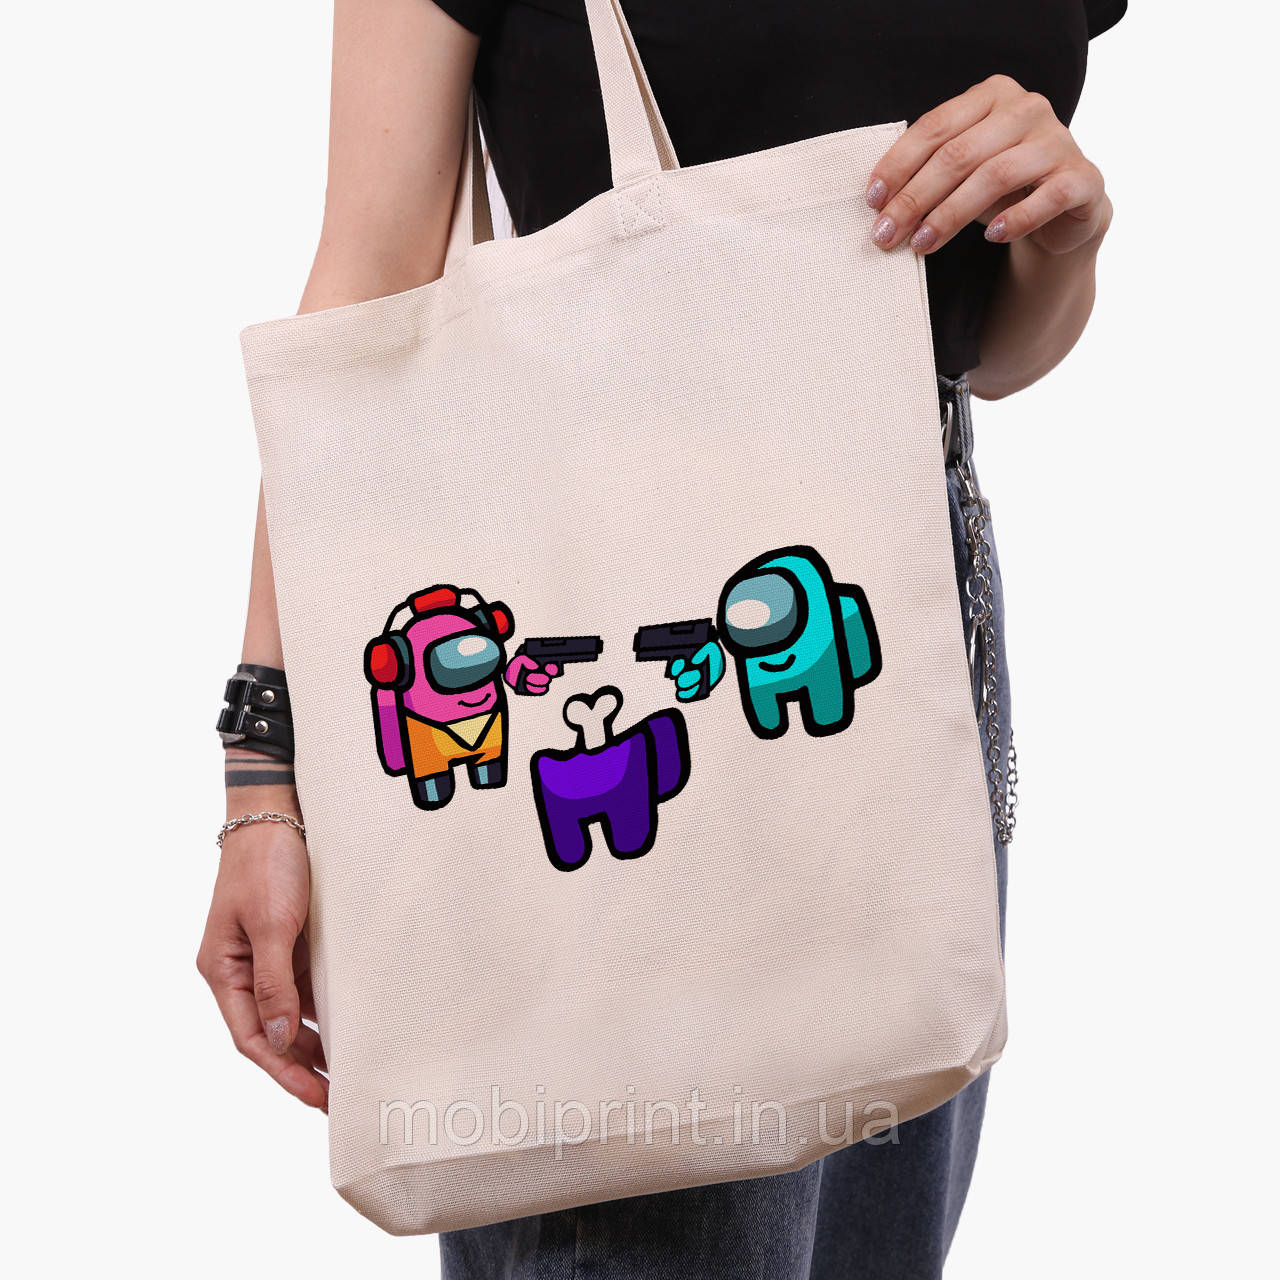 Еко сумка шоппер біла Амонг Ас (Among Us) (9227-2598-1) 41*39*8 см